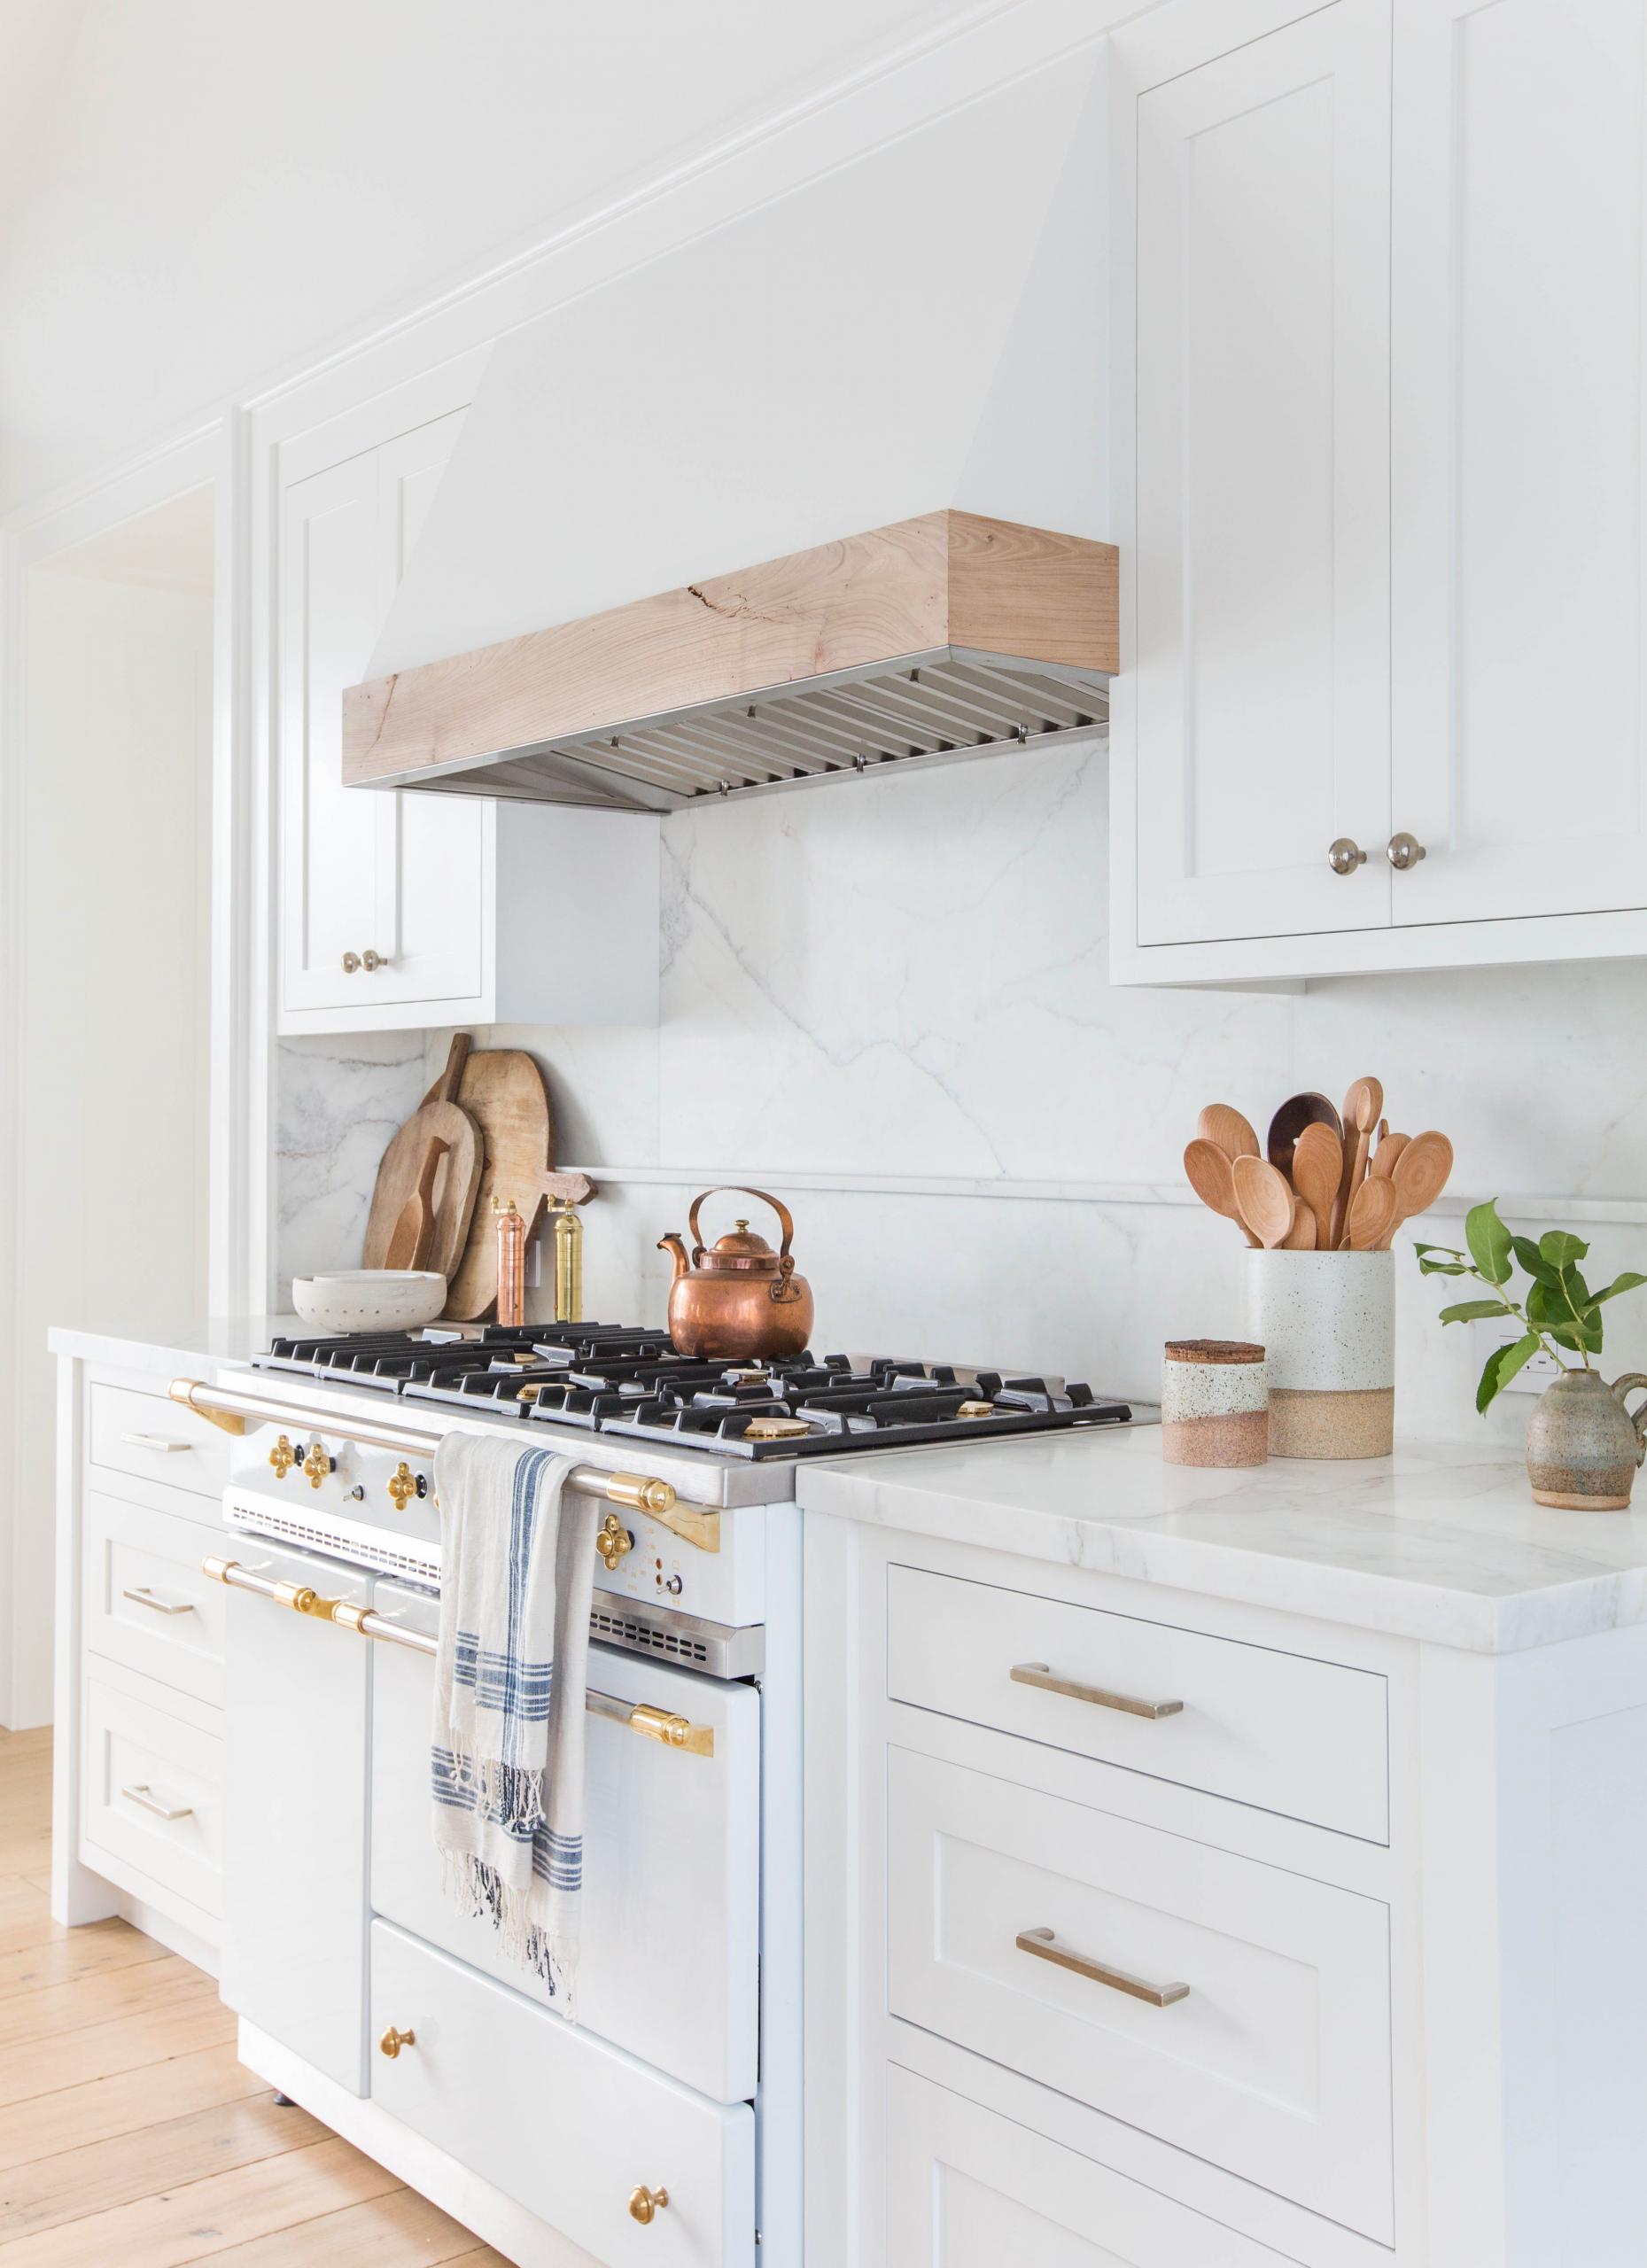 Unique Kitchens with White Cabinets 9 White Kitchen Cabinet Ideas ...